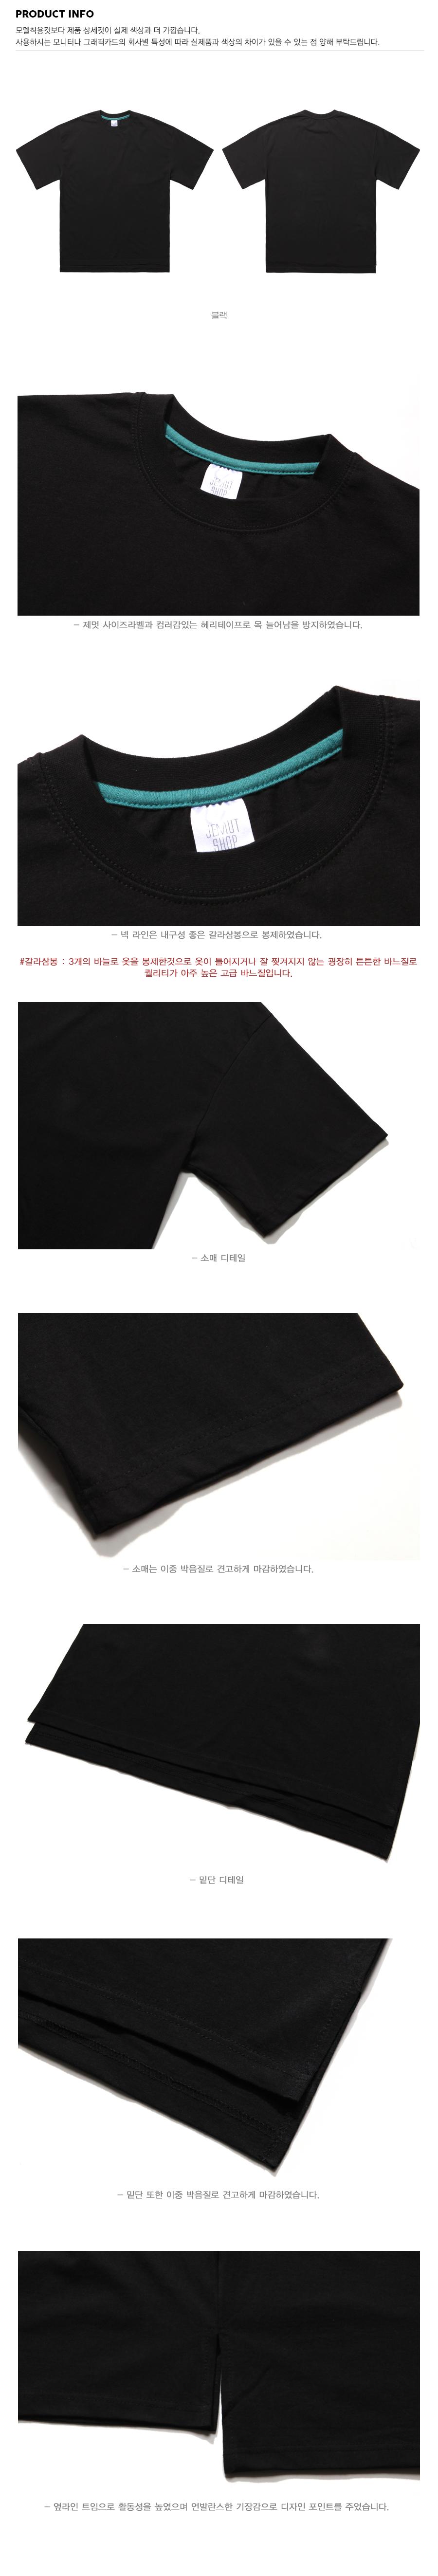 20180423_rebo_overfit_black_kj.jpg